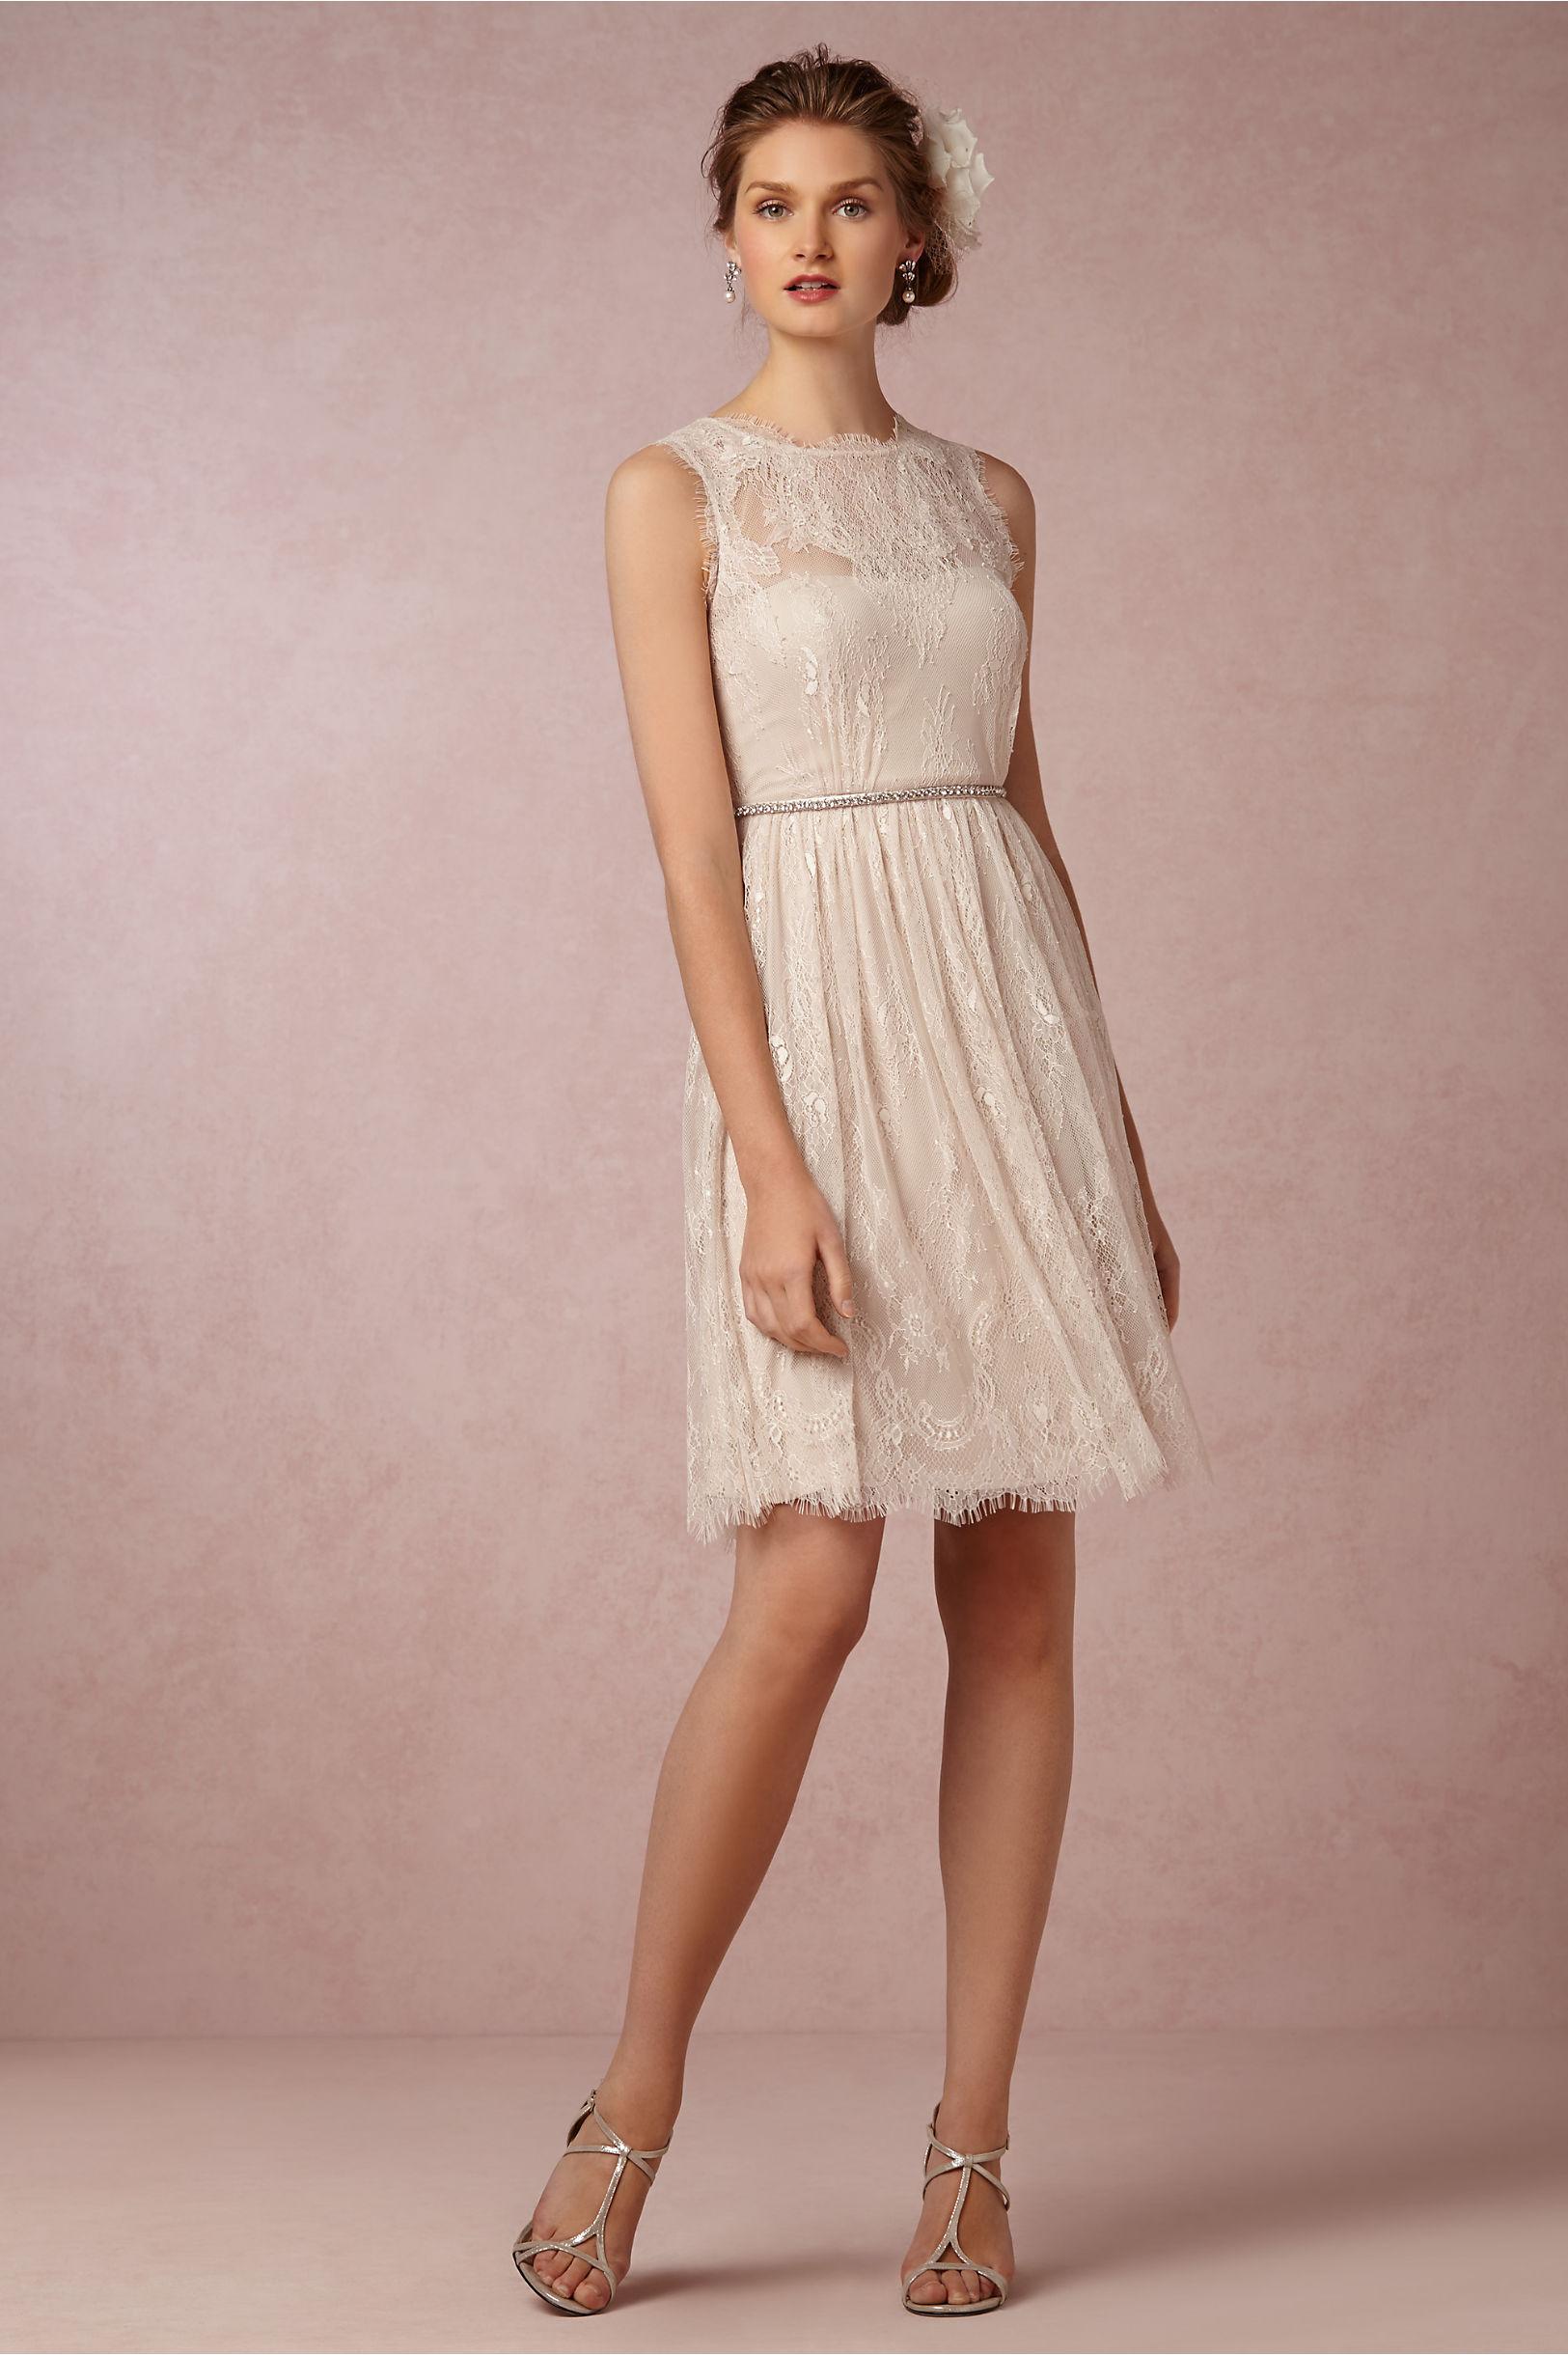 Light Dresses